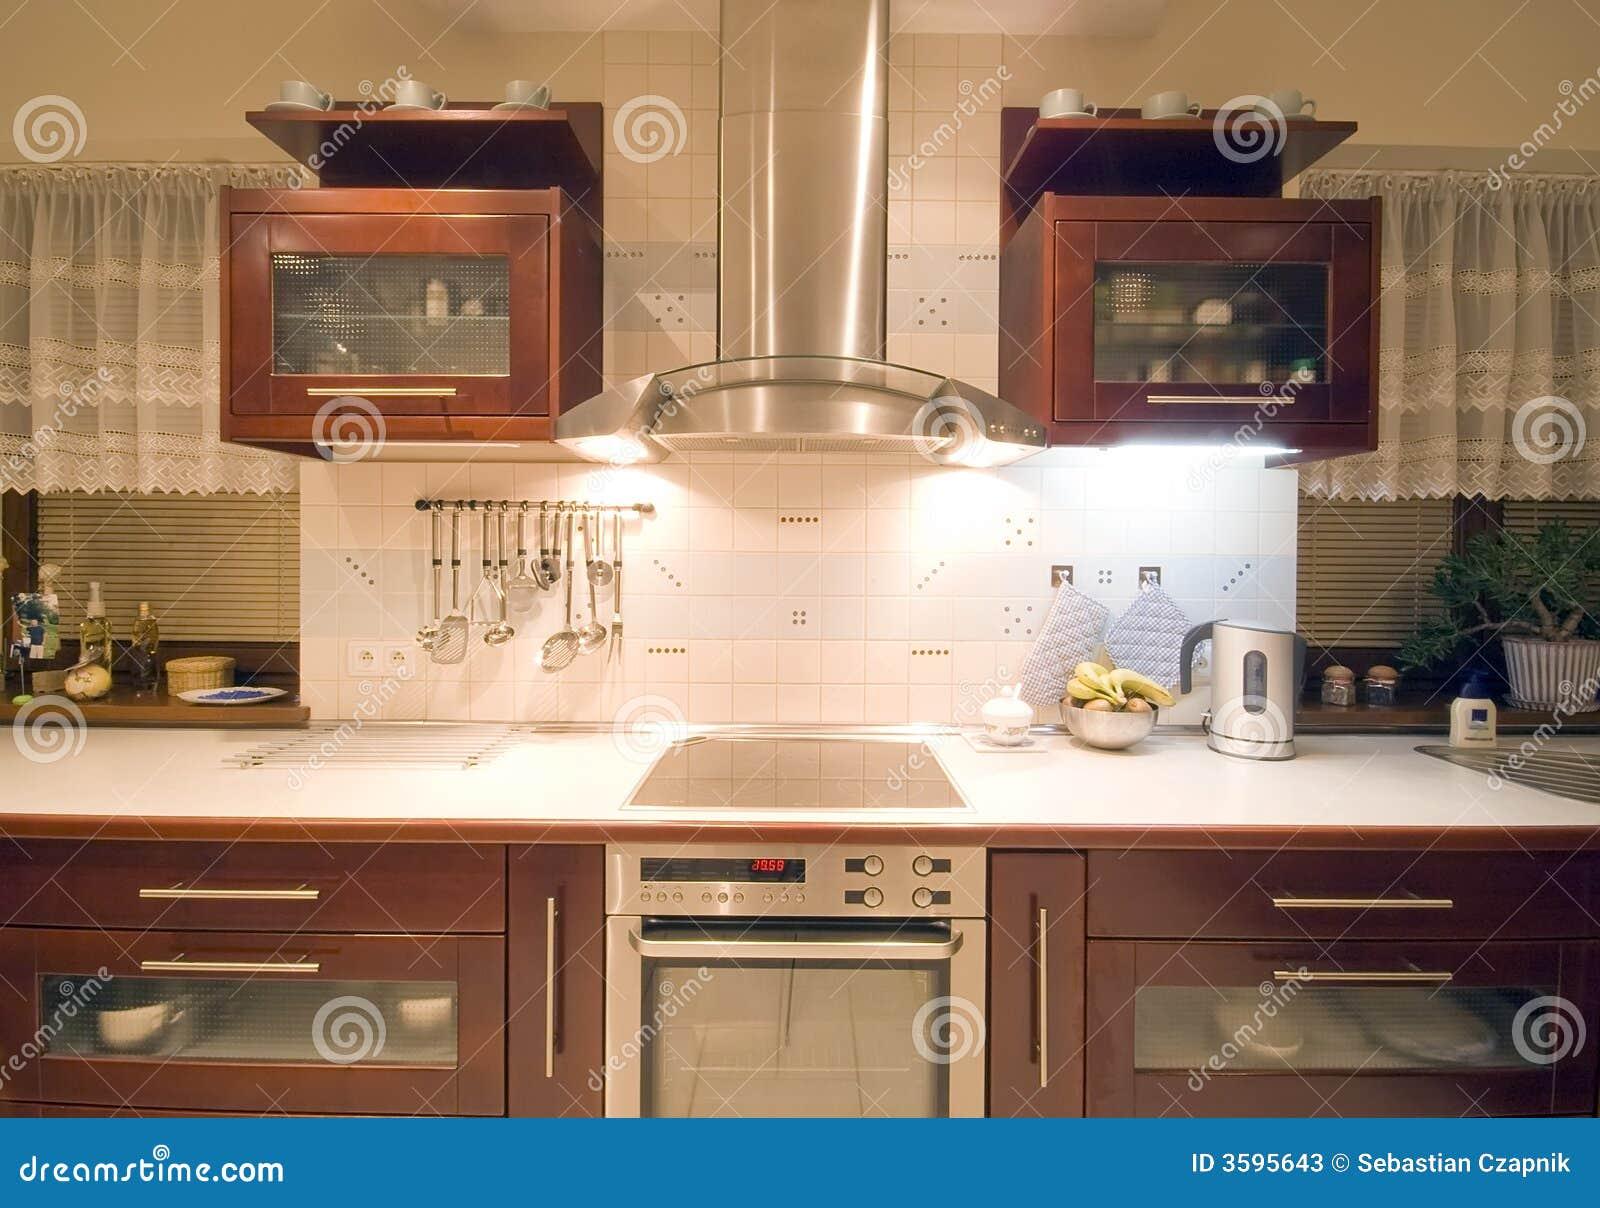 brown kitchen interior stock photos - image: 3595643